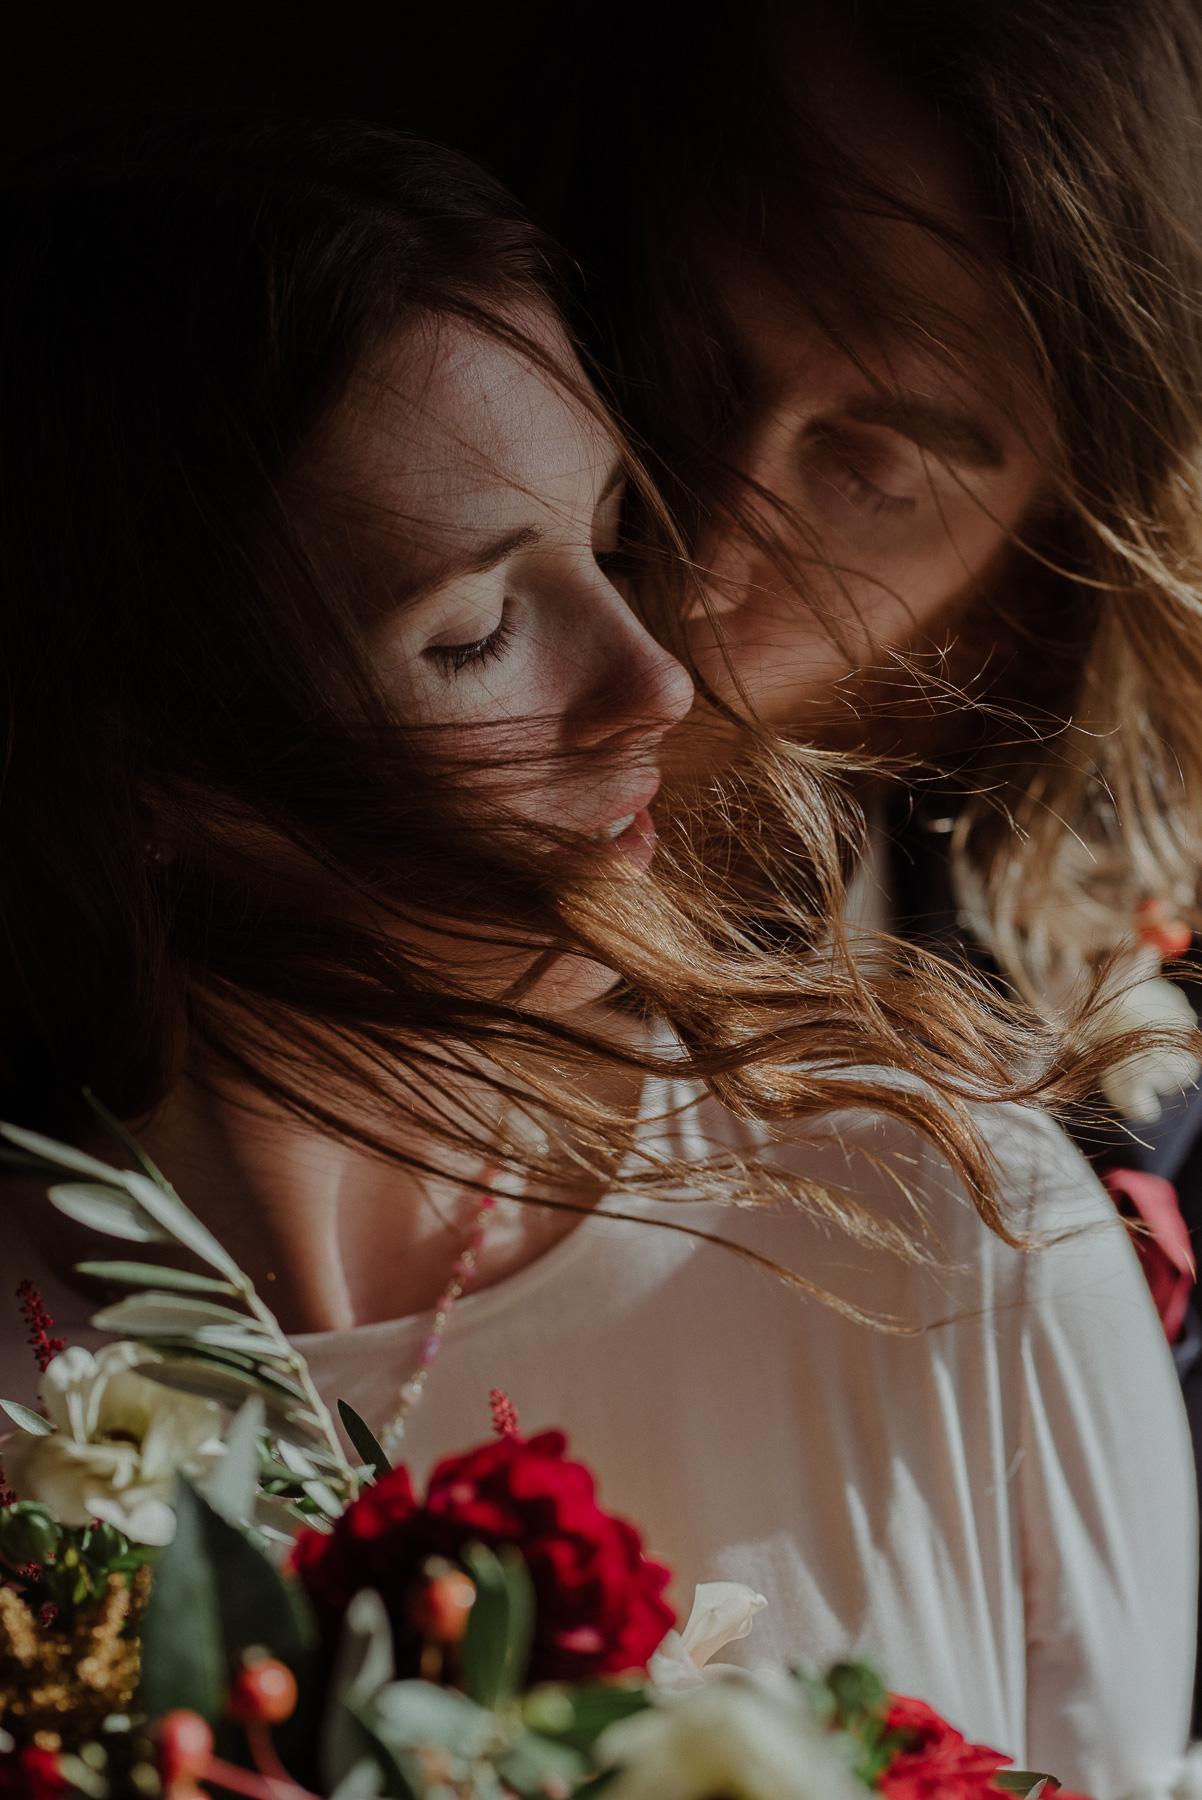 enowen-wedding-photography-linville-nc-carson-john-elopement (87 of 109).jpg